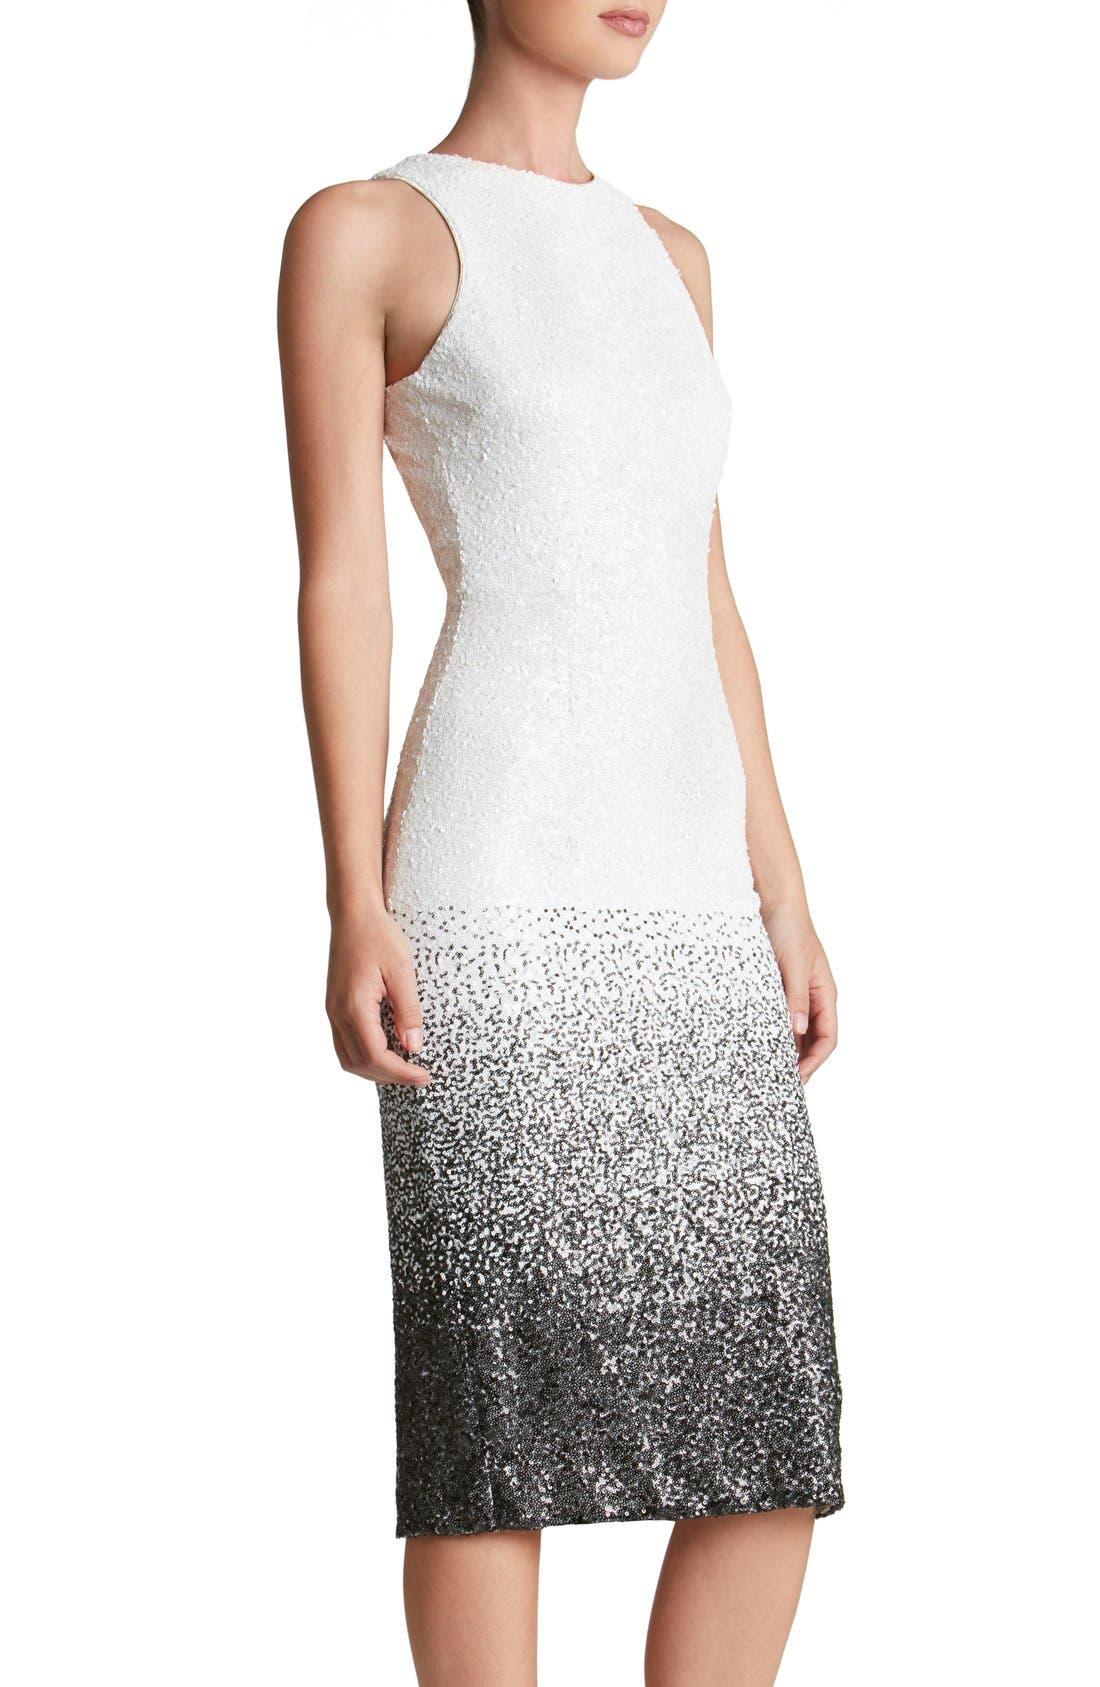 Shawn Sequin Midi Dress,                             Alternate thumbnail 4, color,                             121